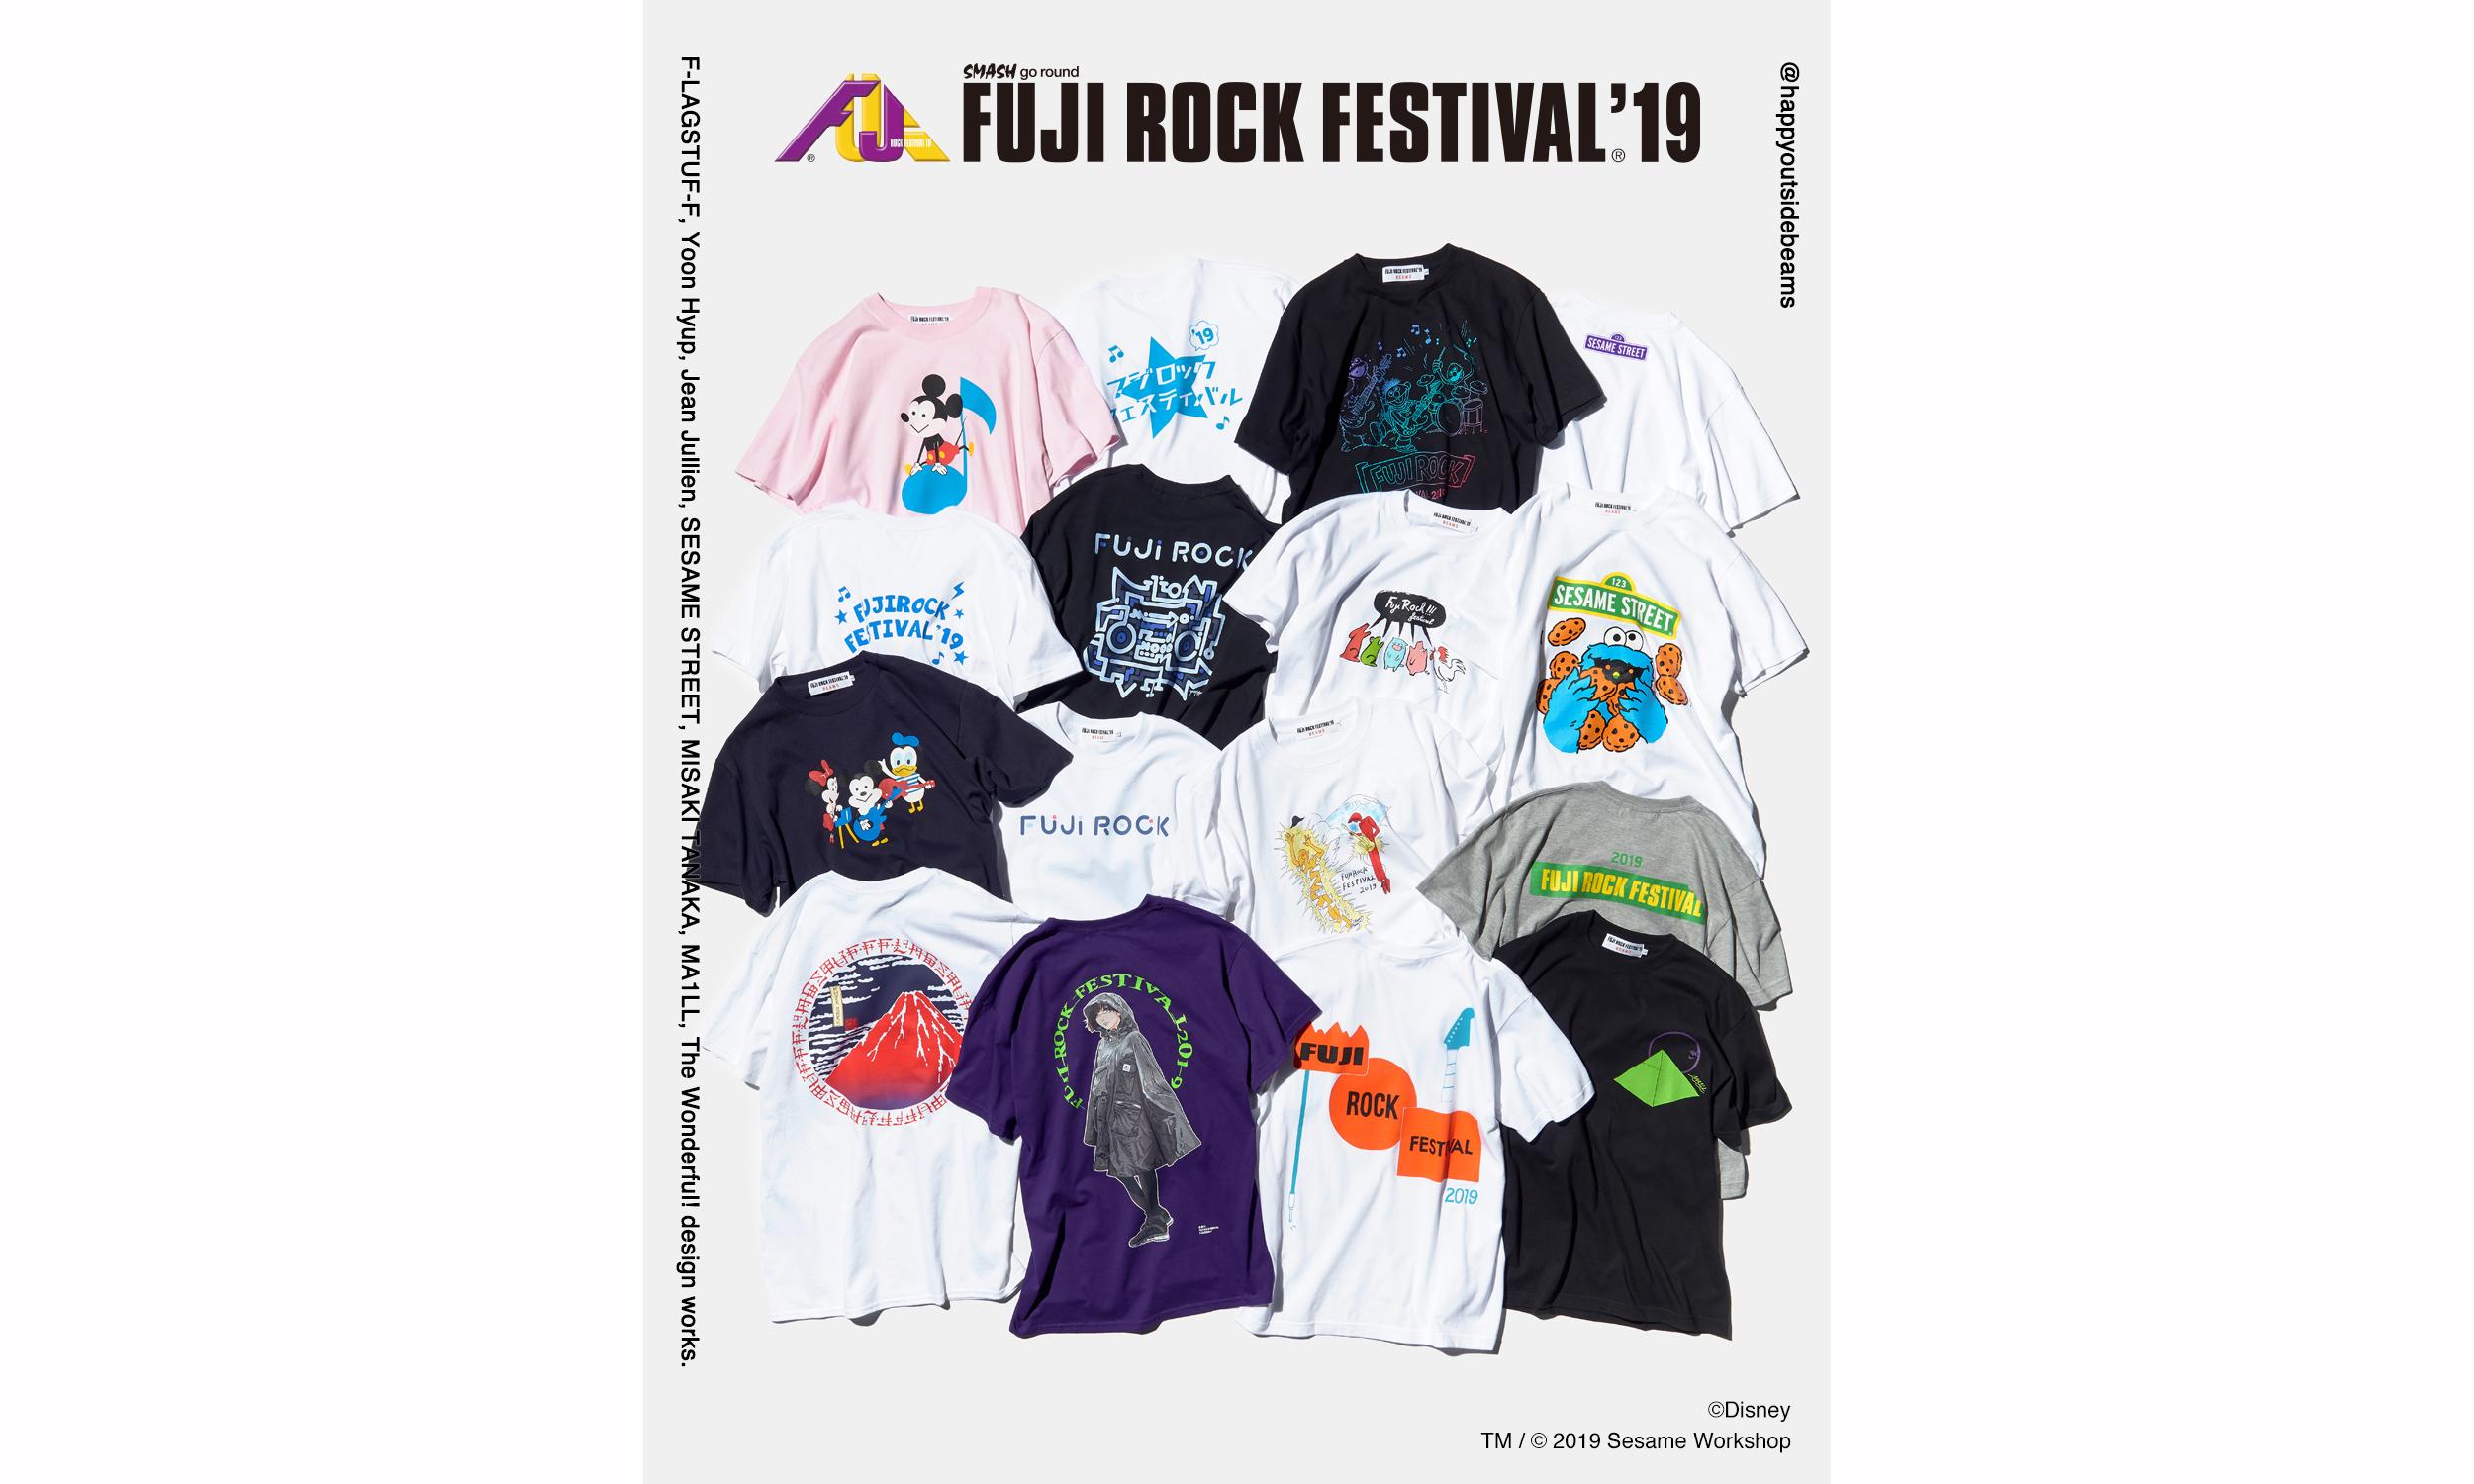 FUJI ROCK FESTIVAL x BEAMS T 2019 联乘系列发布